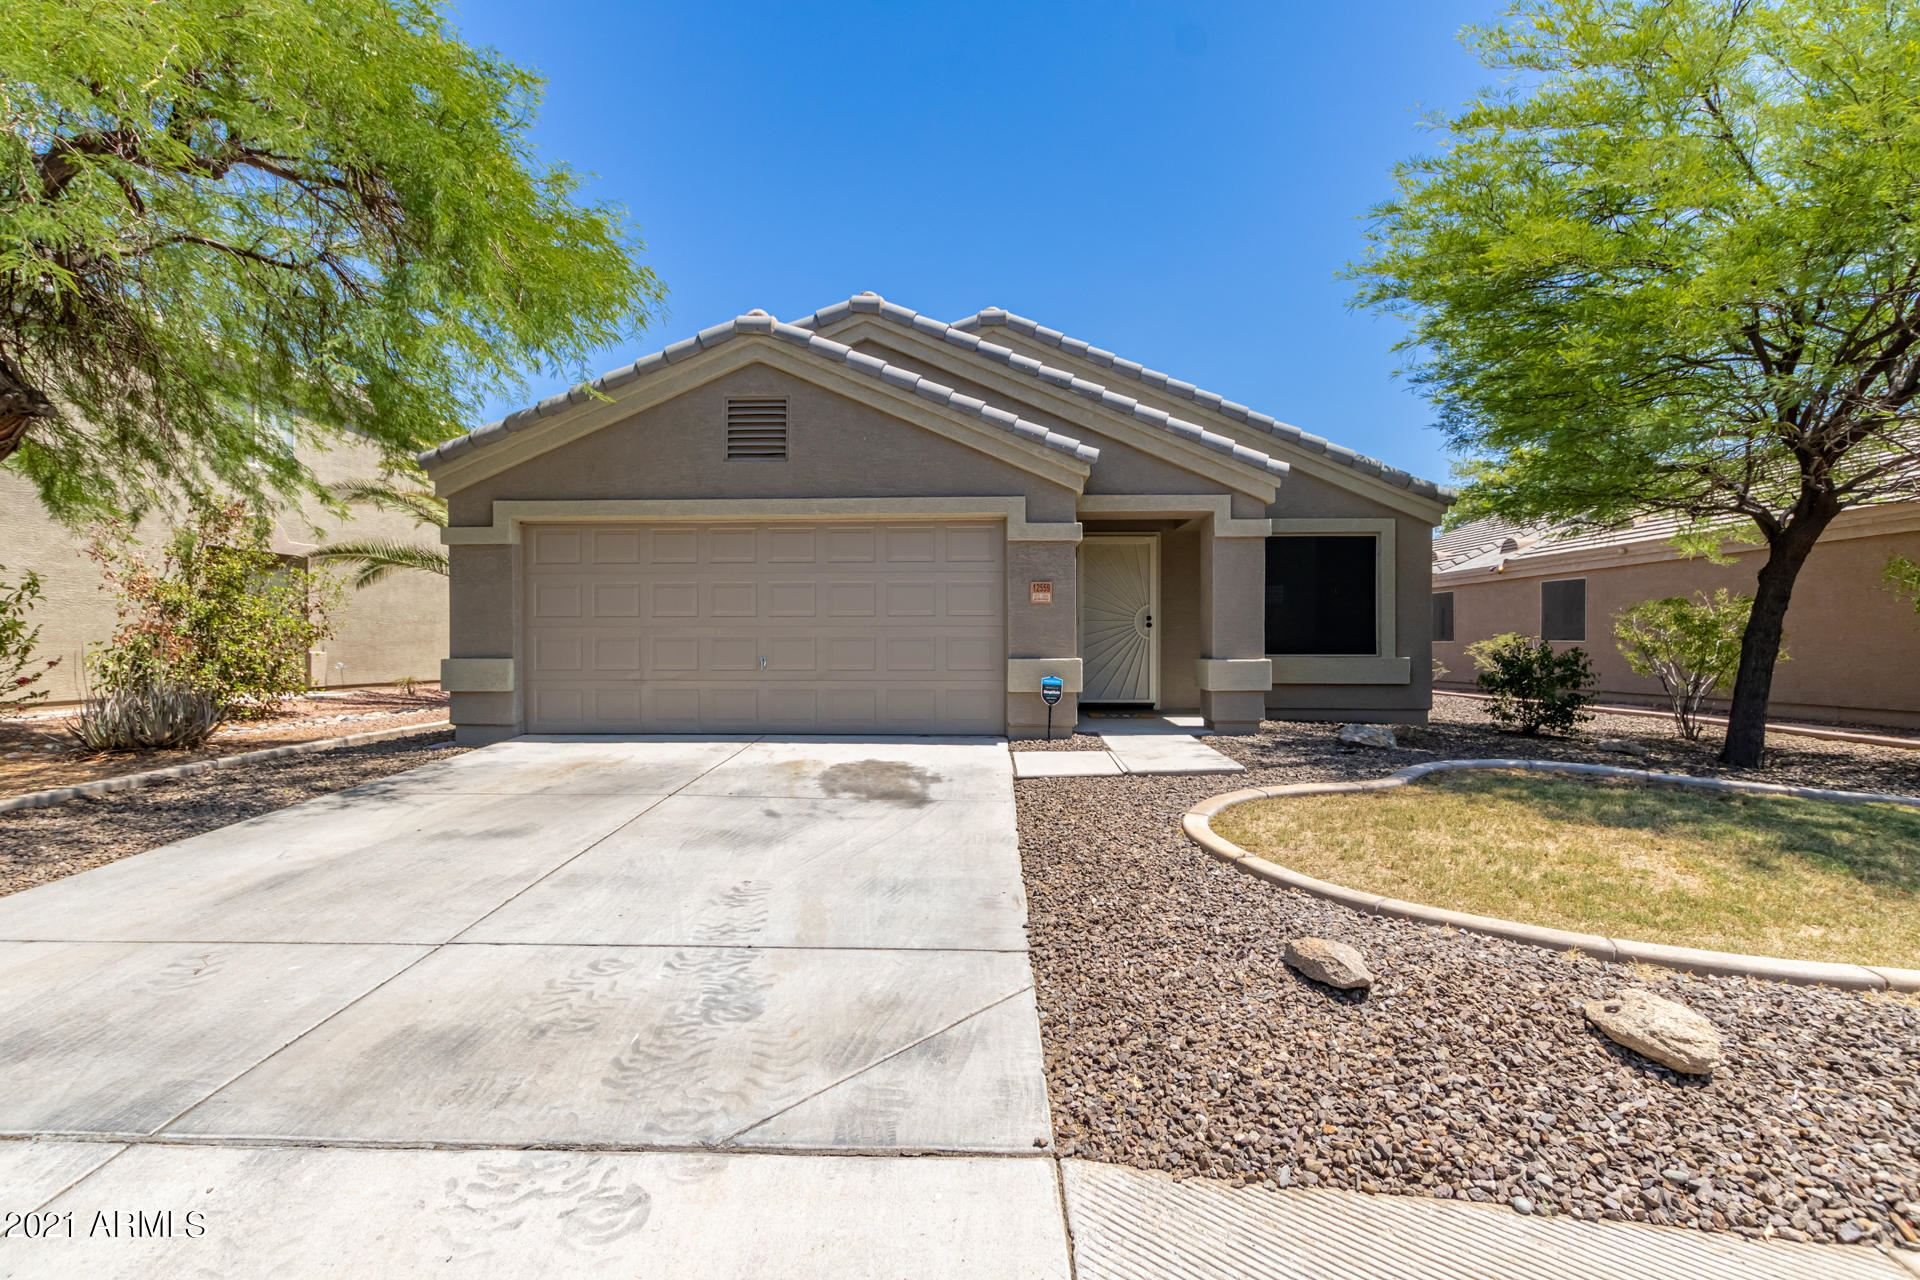 Photo of 12559 W LISBON Lane, El Mirage, AZ 85335 (MLS # 6241113)